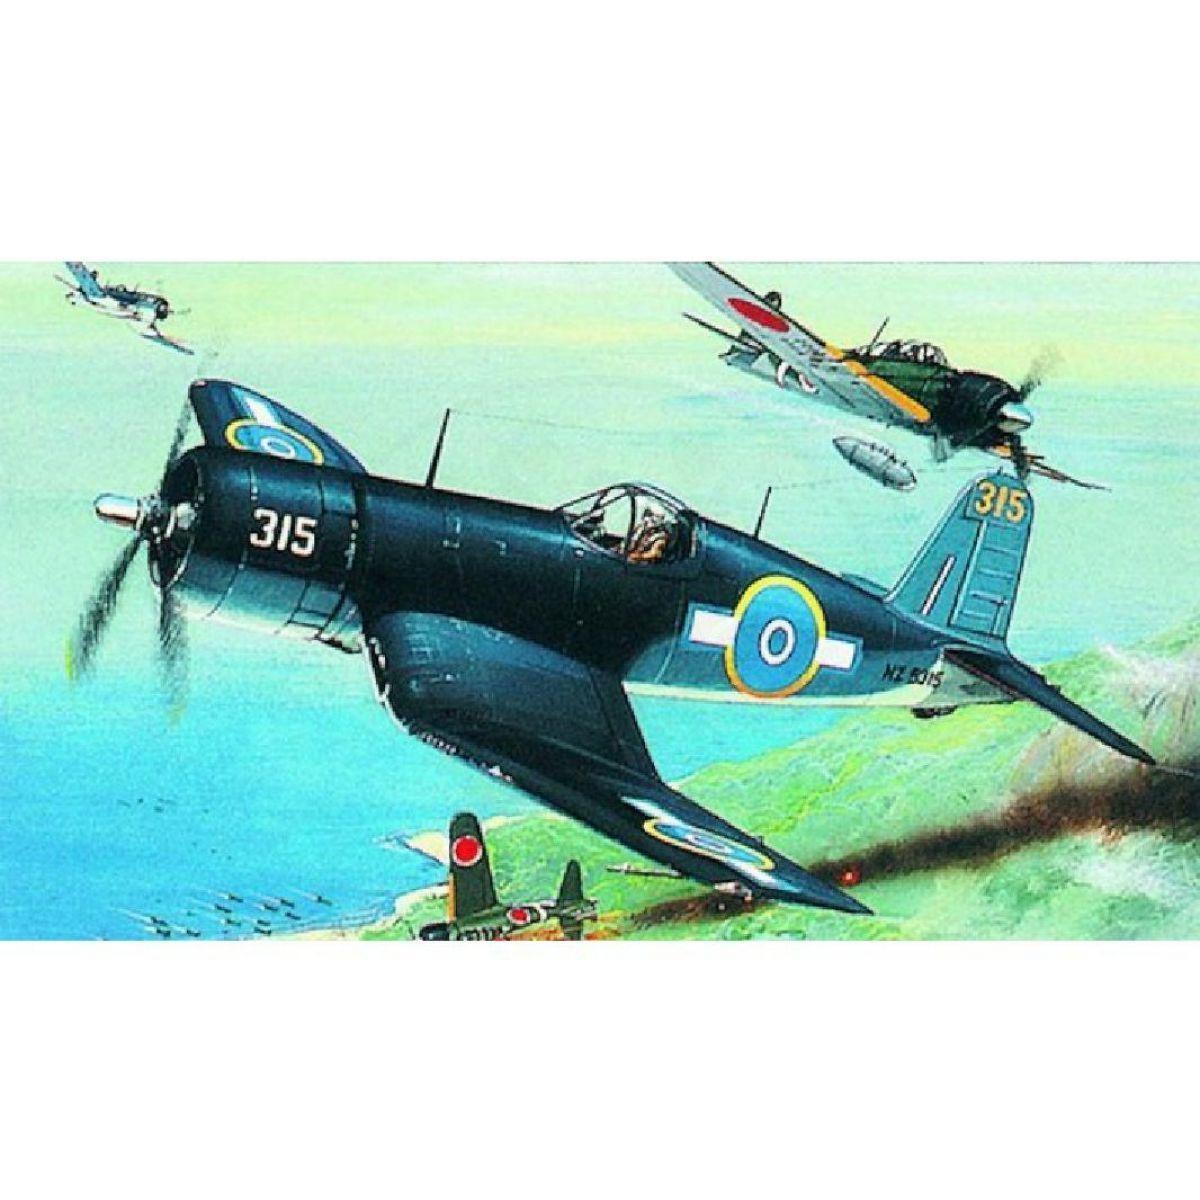 Směr Model letadla Chance Vought F4U 1 Corsair 1:72